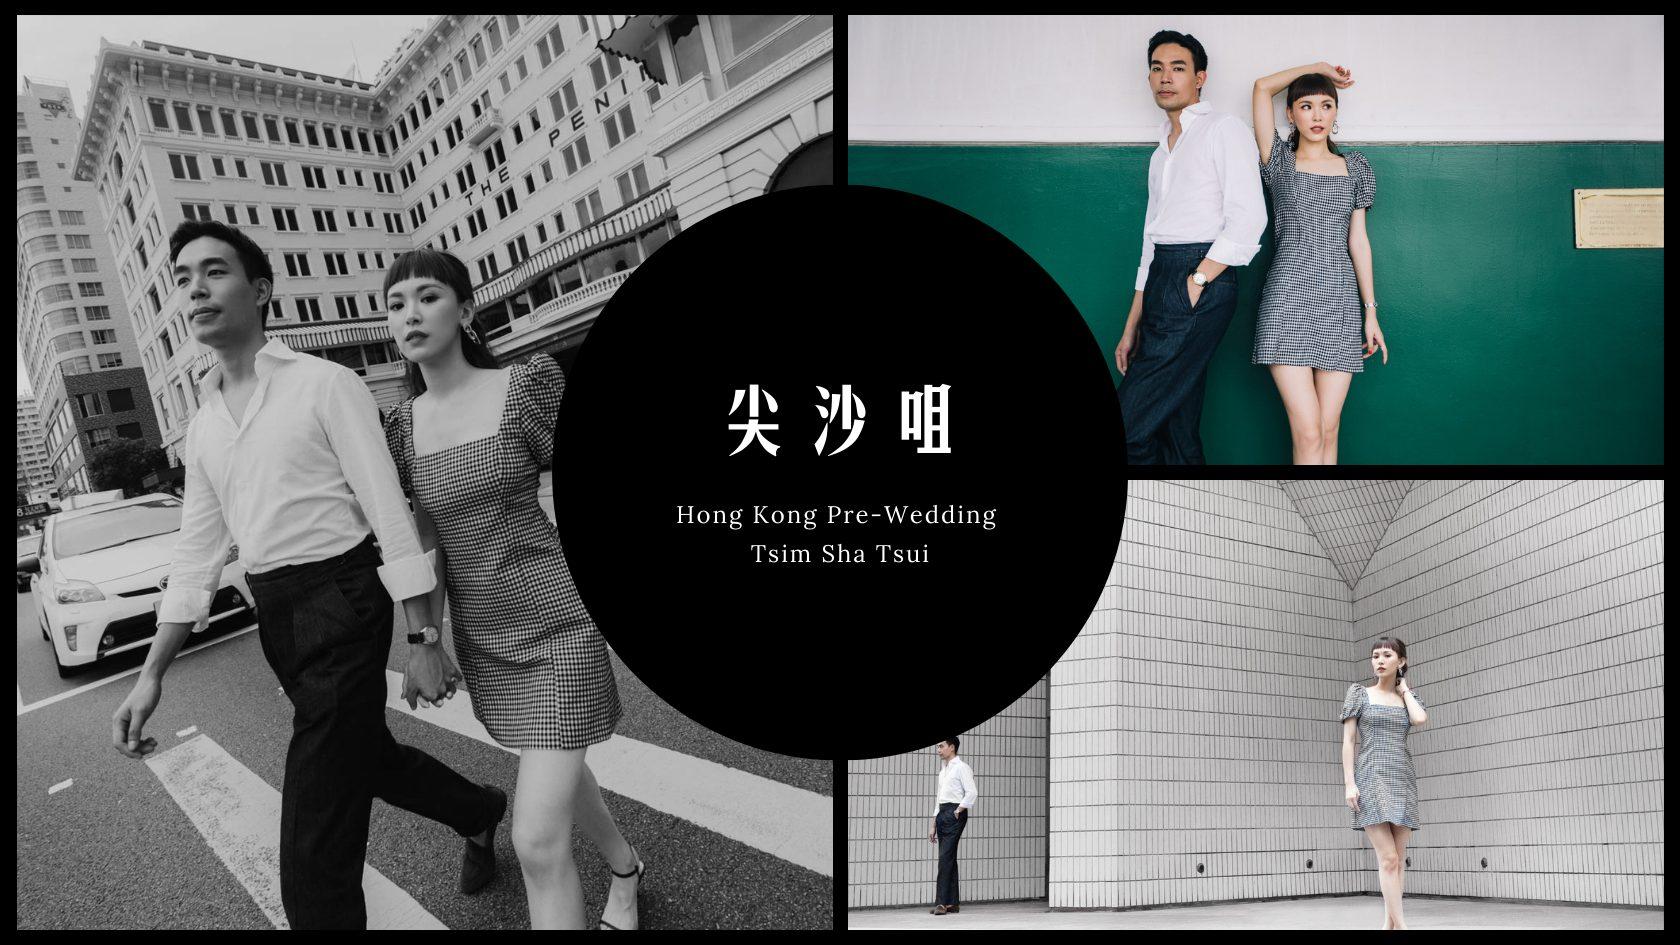 Hong Kong Pre-Wedding Spots   香港婚照景點系列  尖沙咀   Tsim Sha Tsui